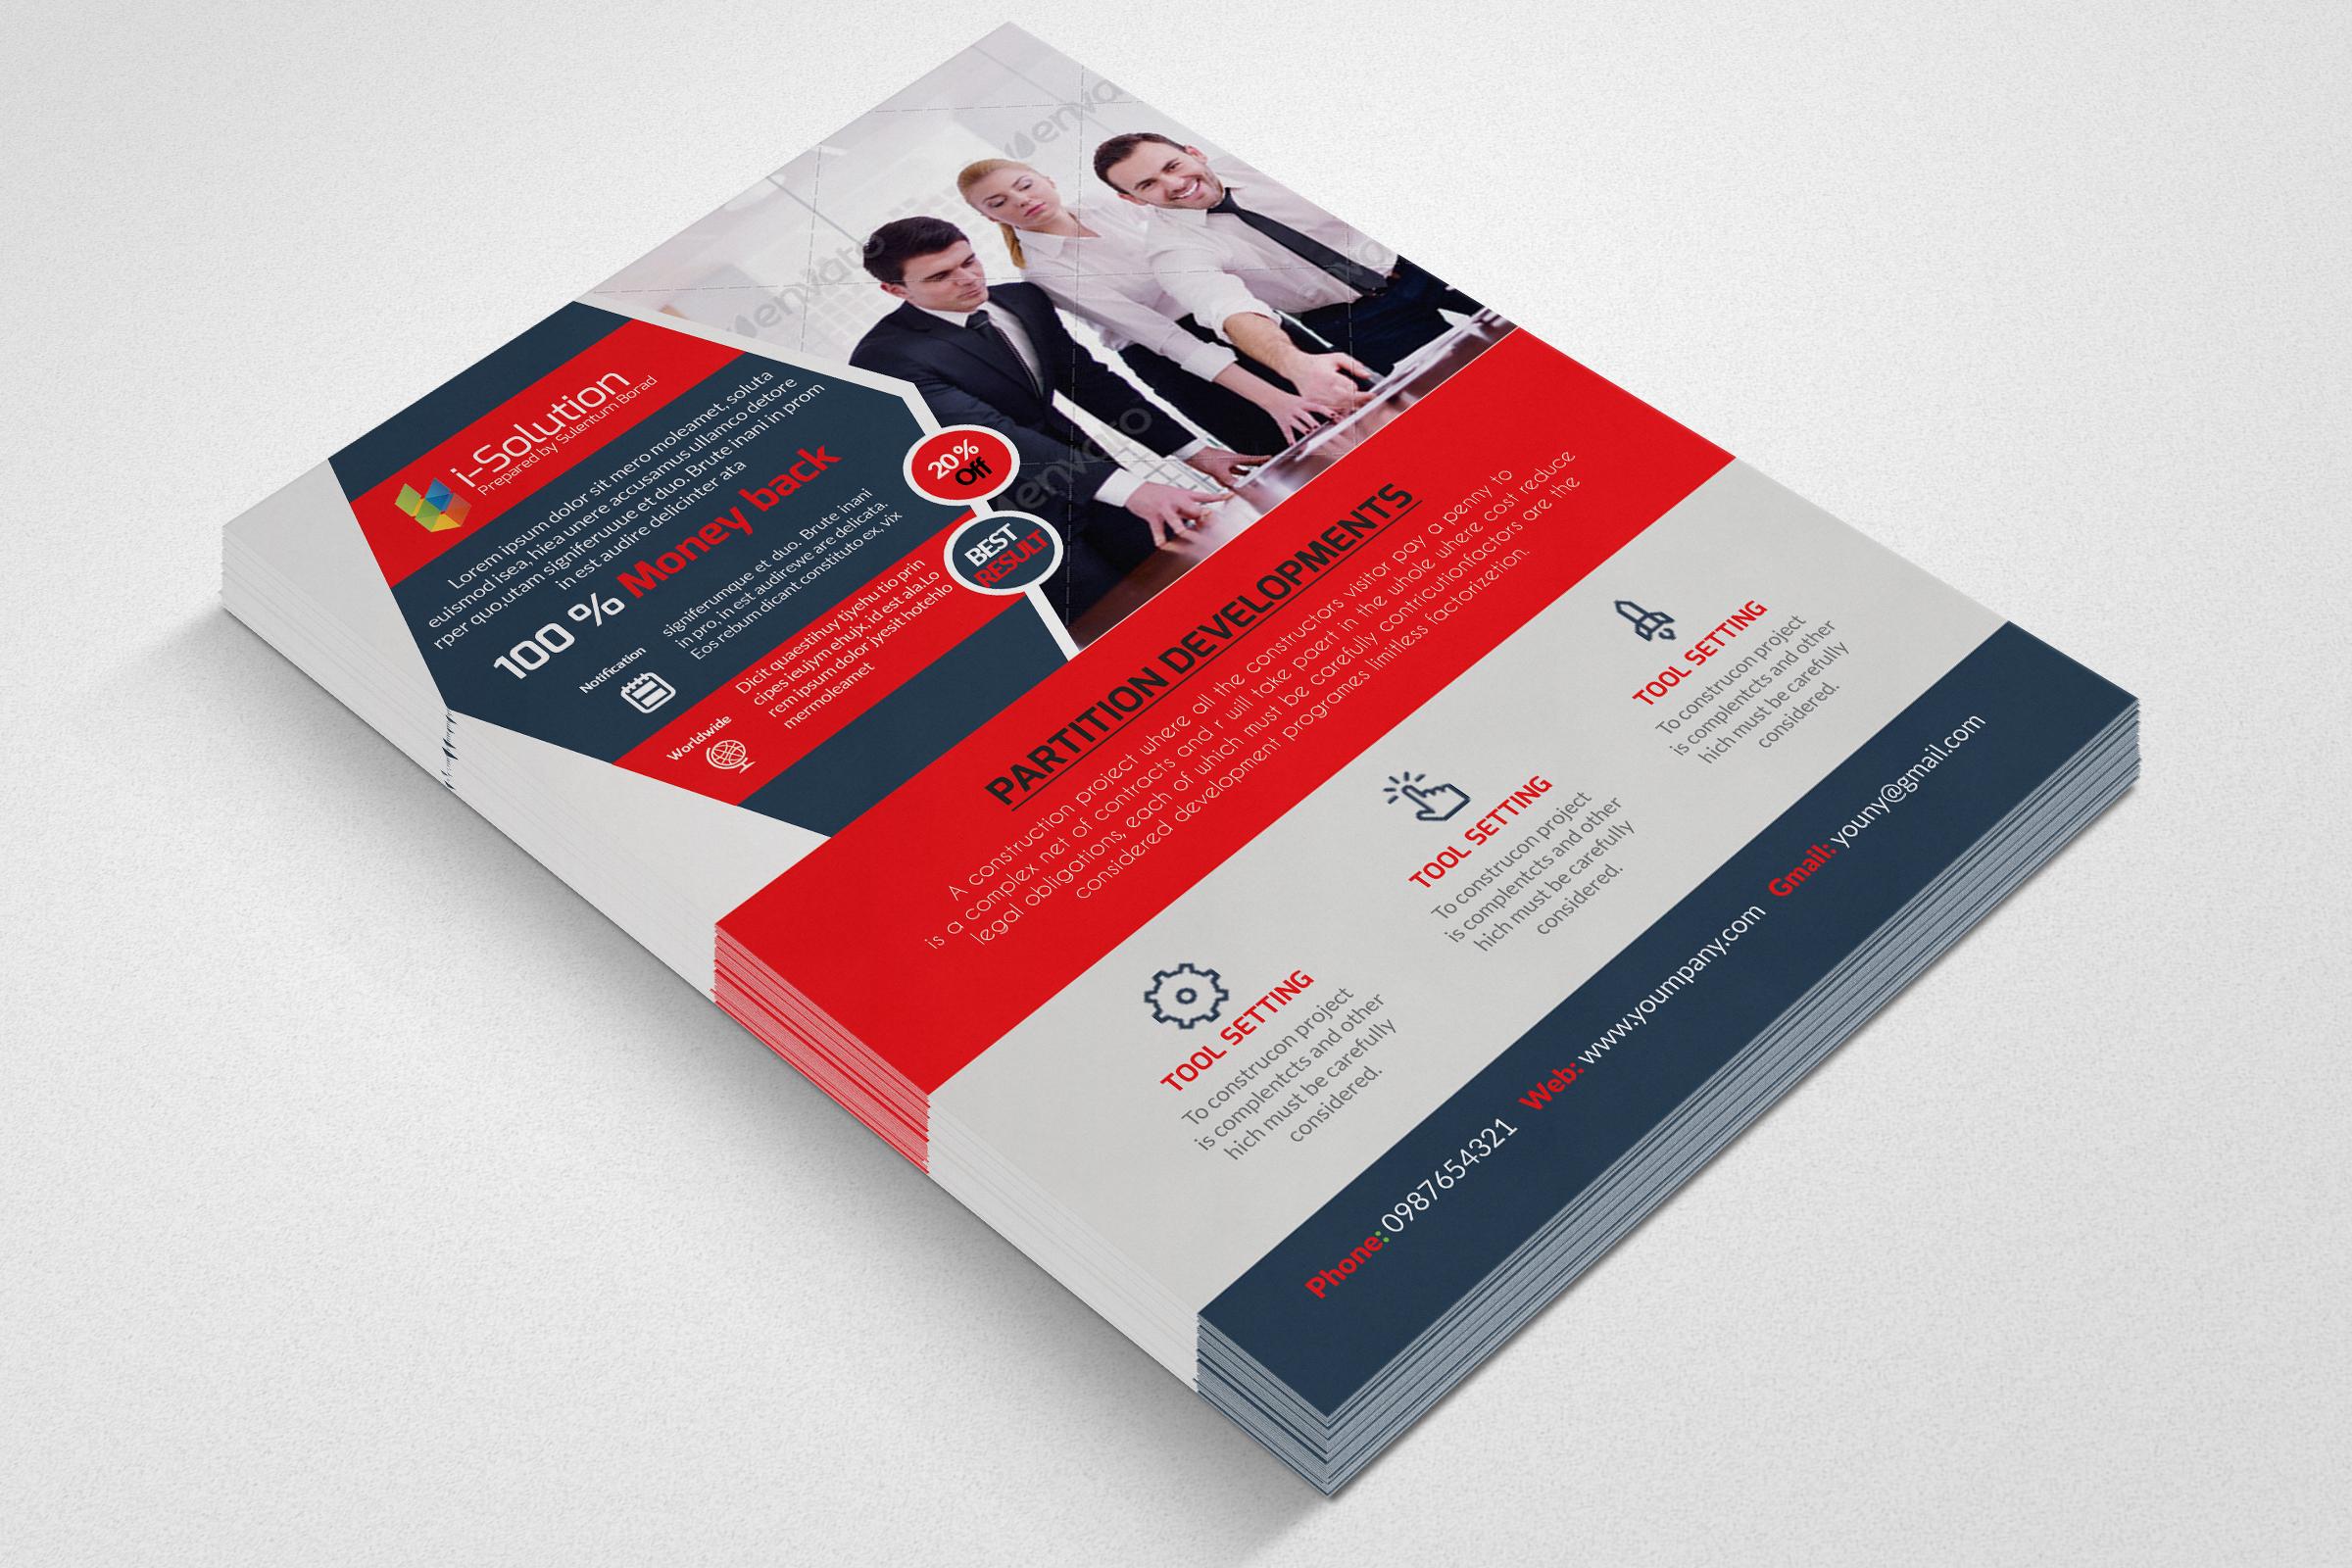 Business Marketing Management Flyers example image 2